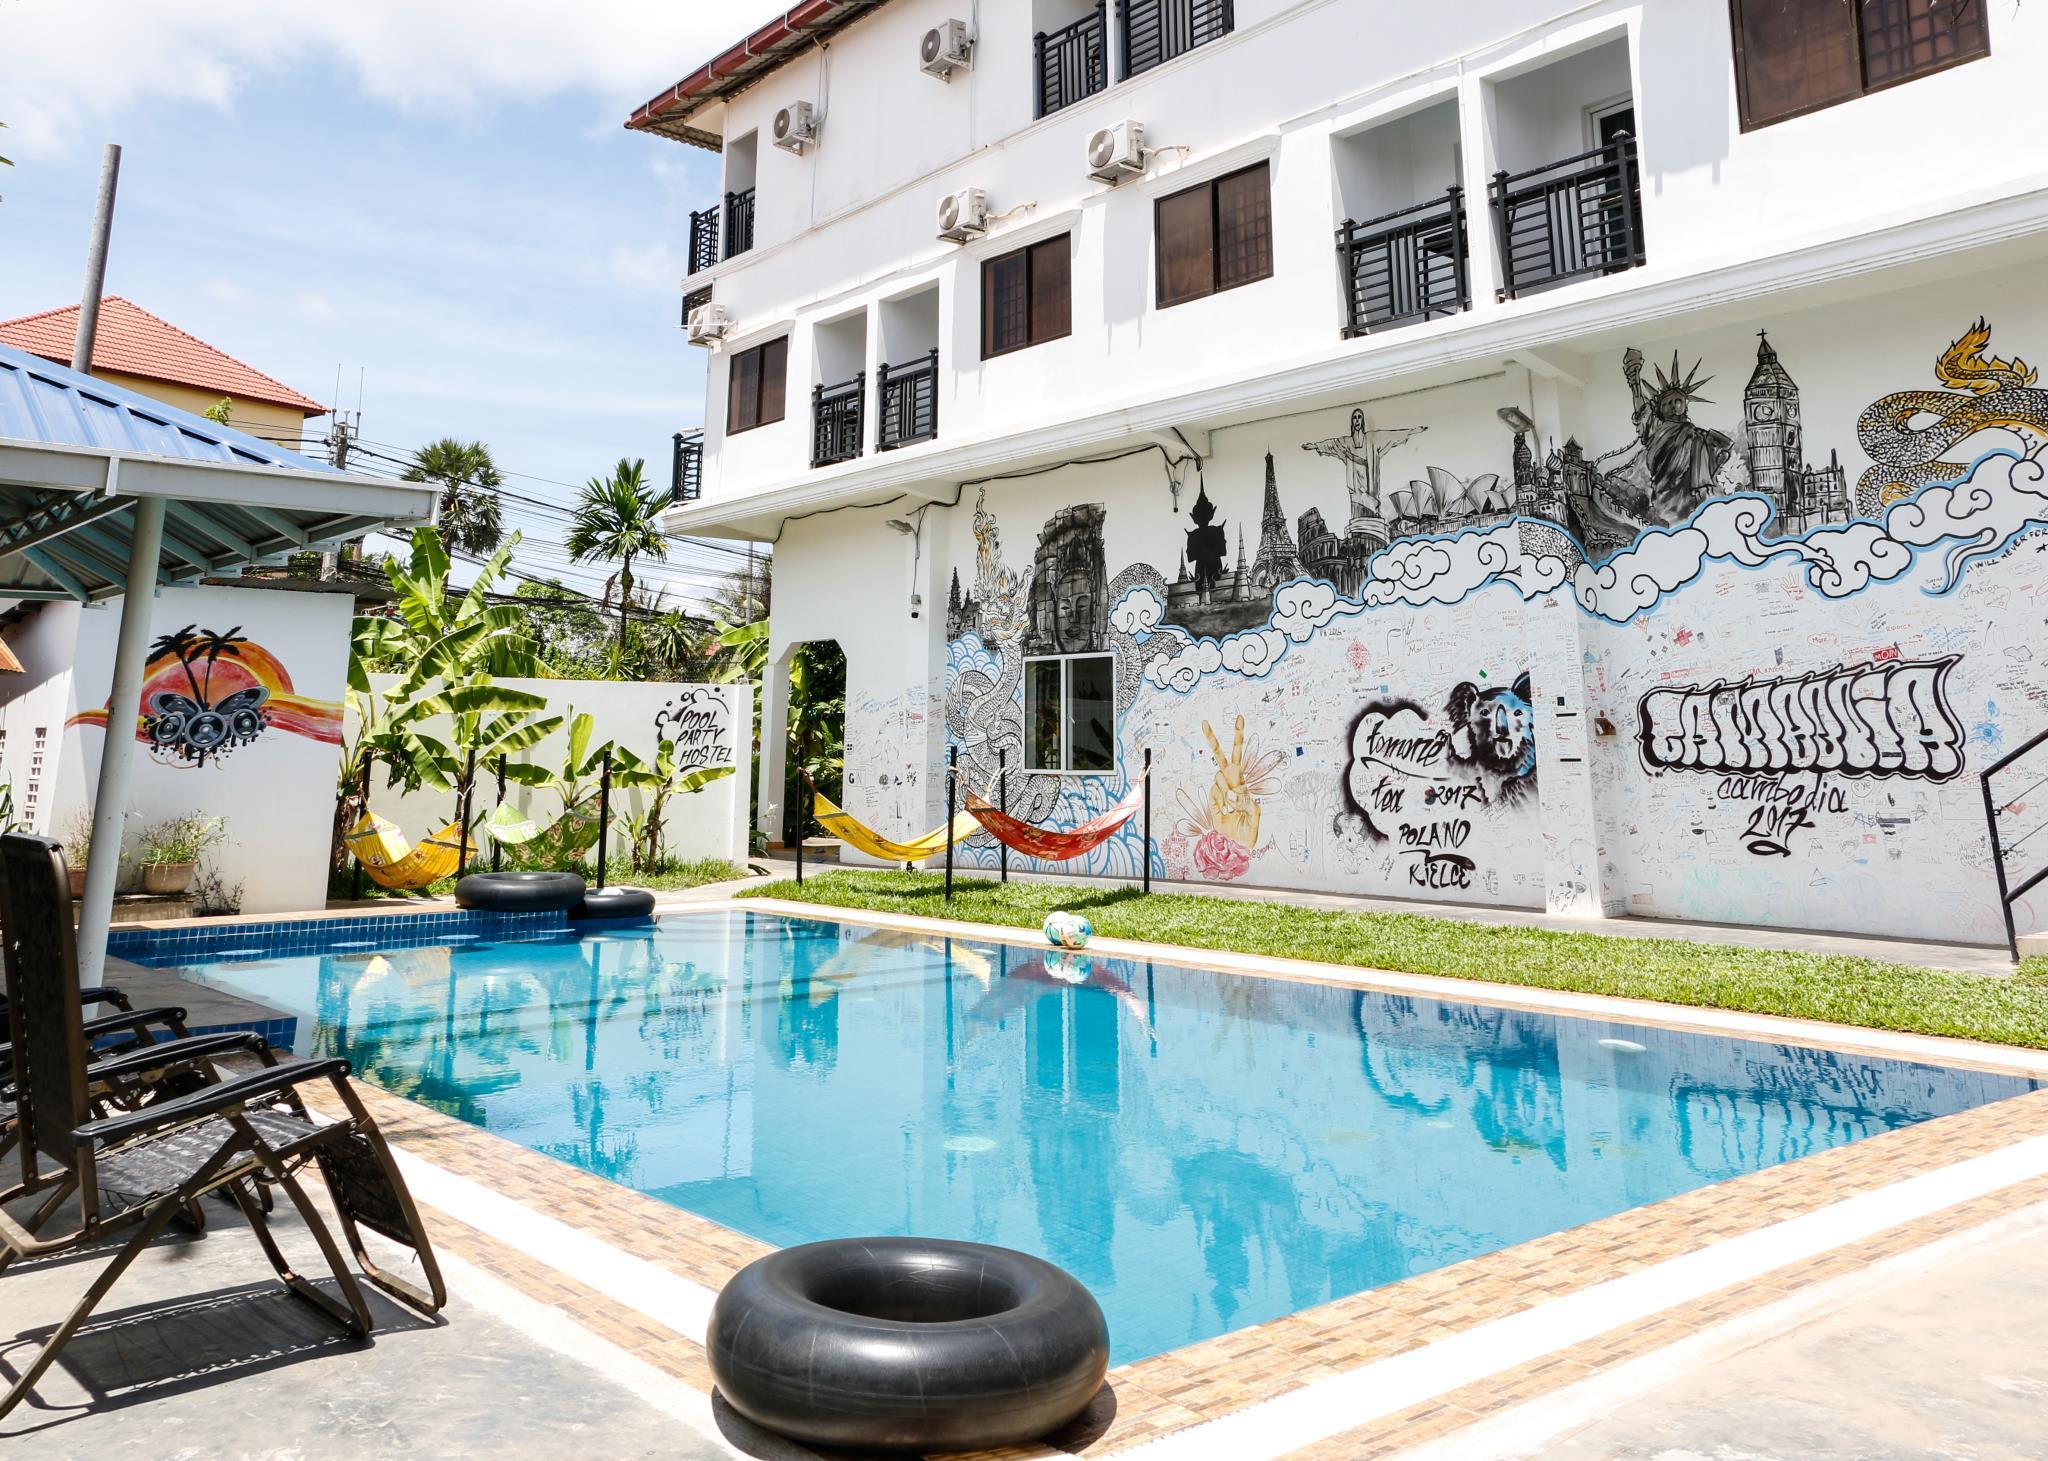 Pool Party Hostel,Siemréab